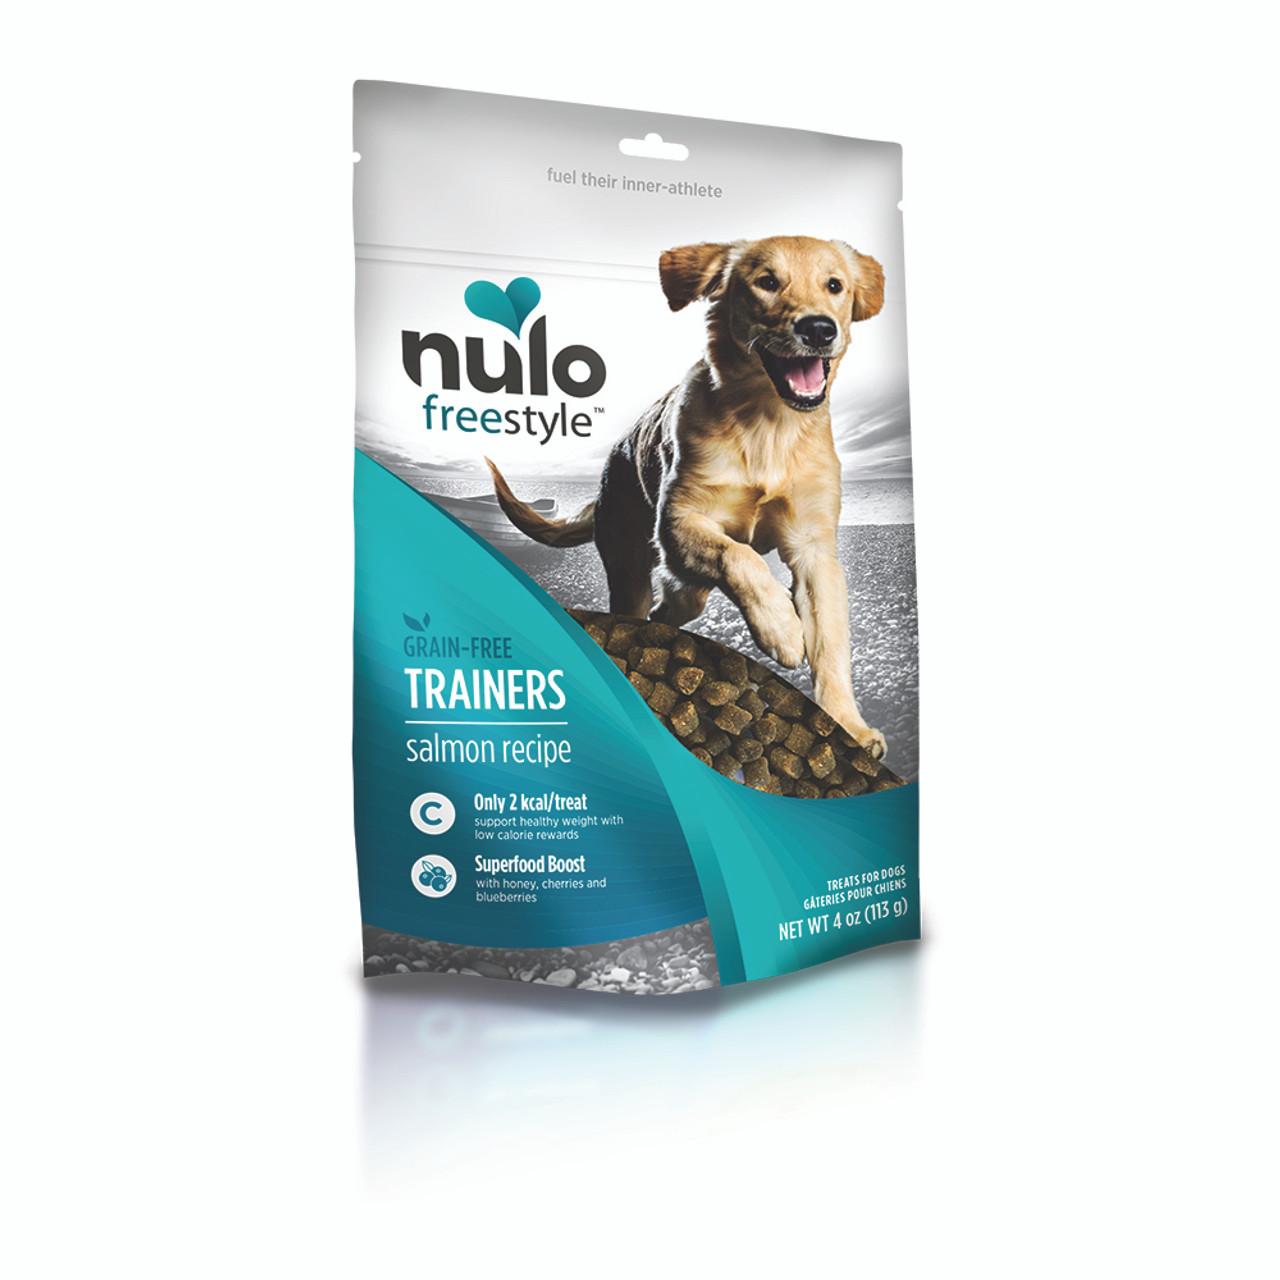 Nulo Freestyle Grain-Free Trainers Salmon Recipe Dog Training Treats